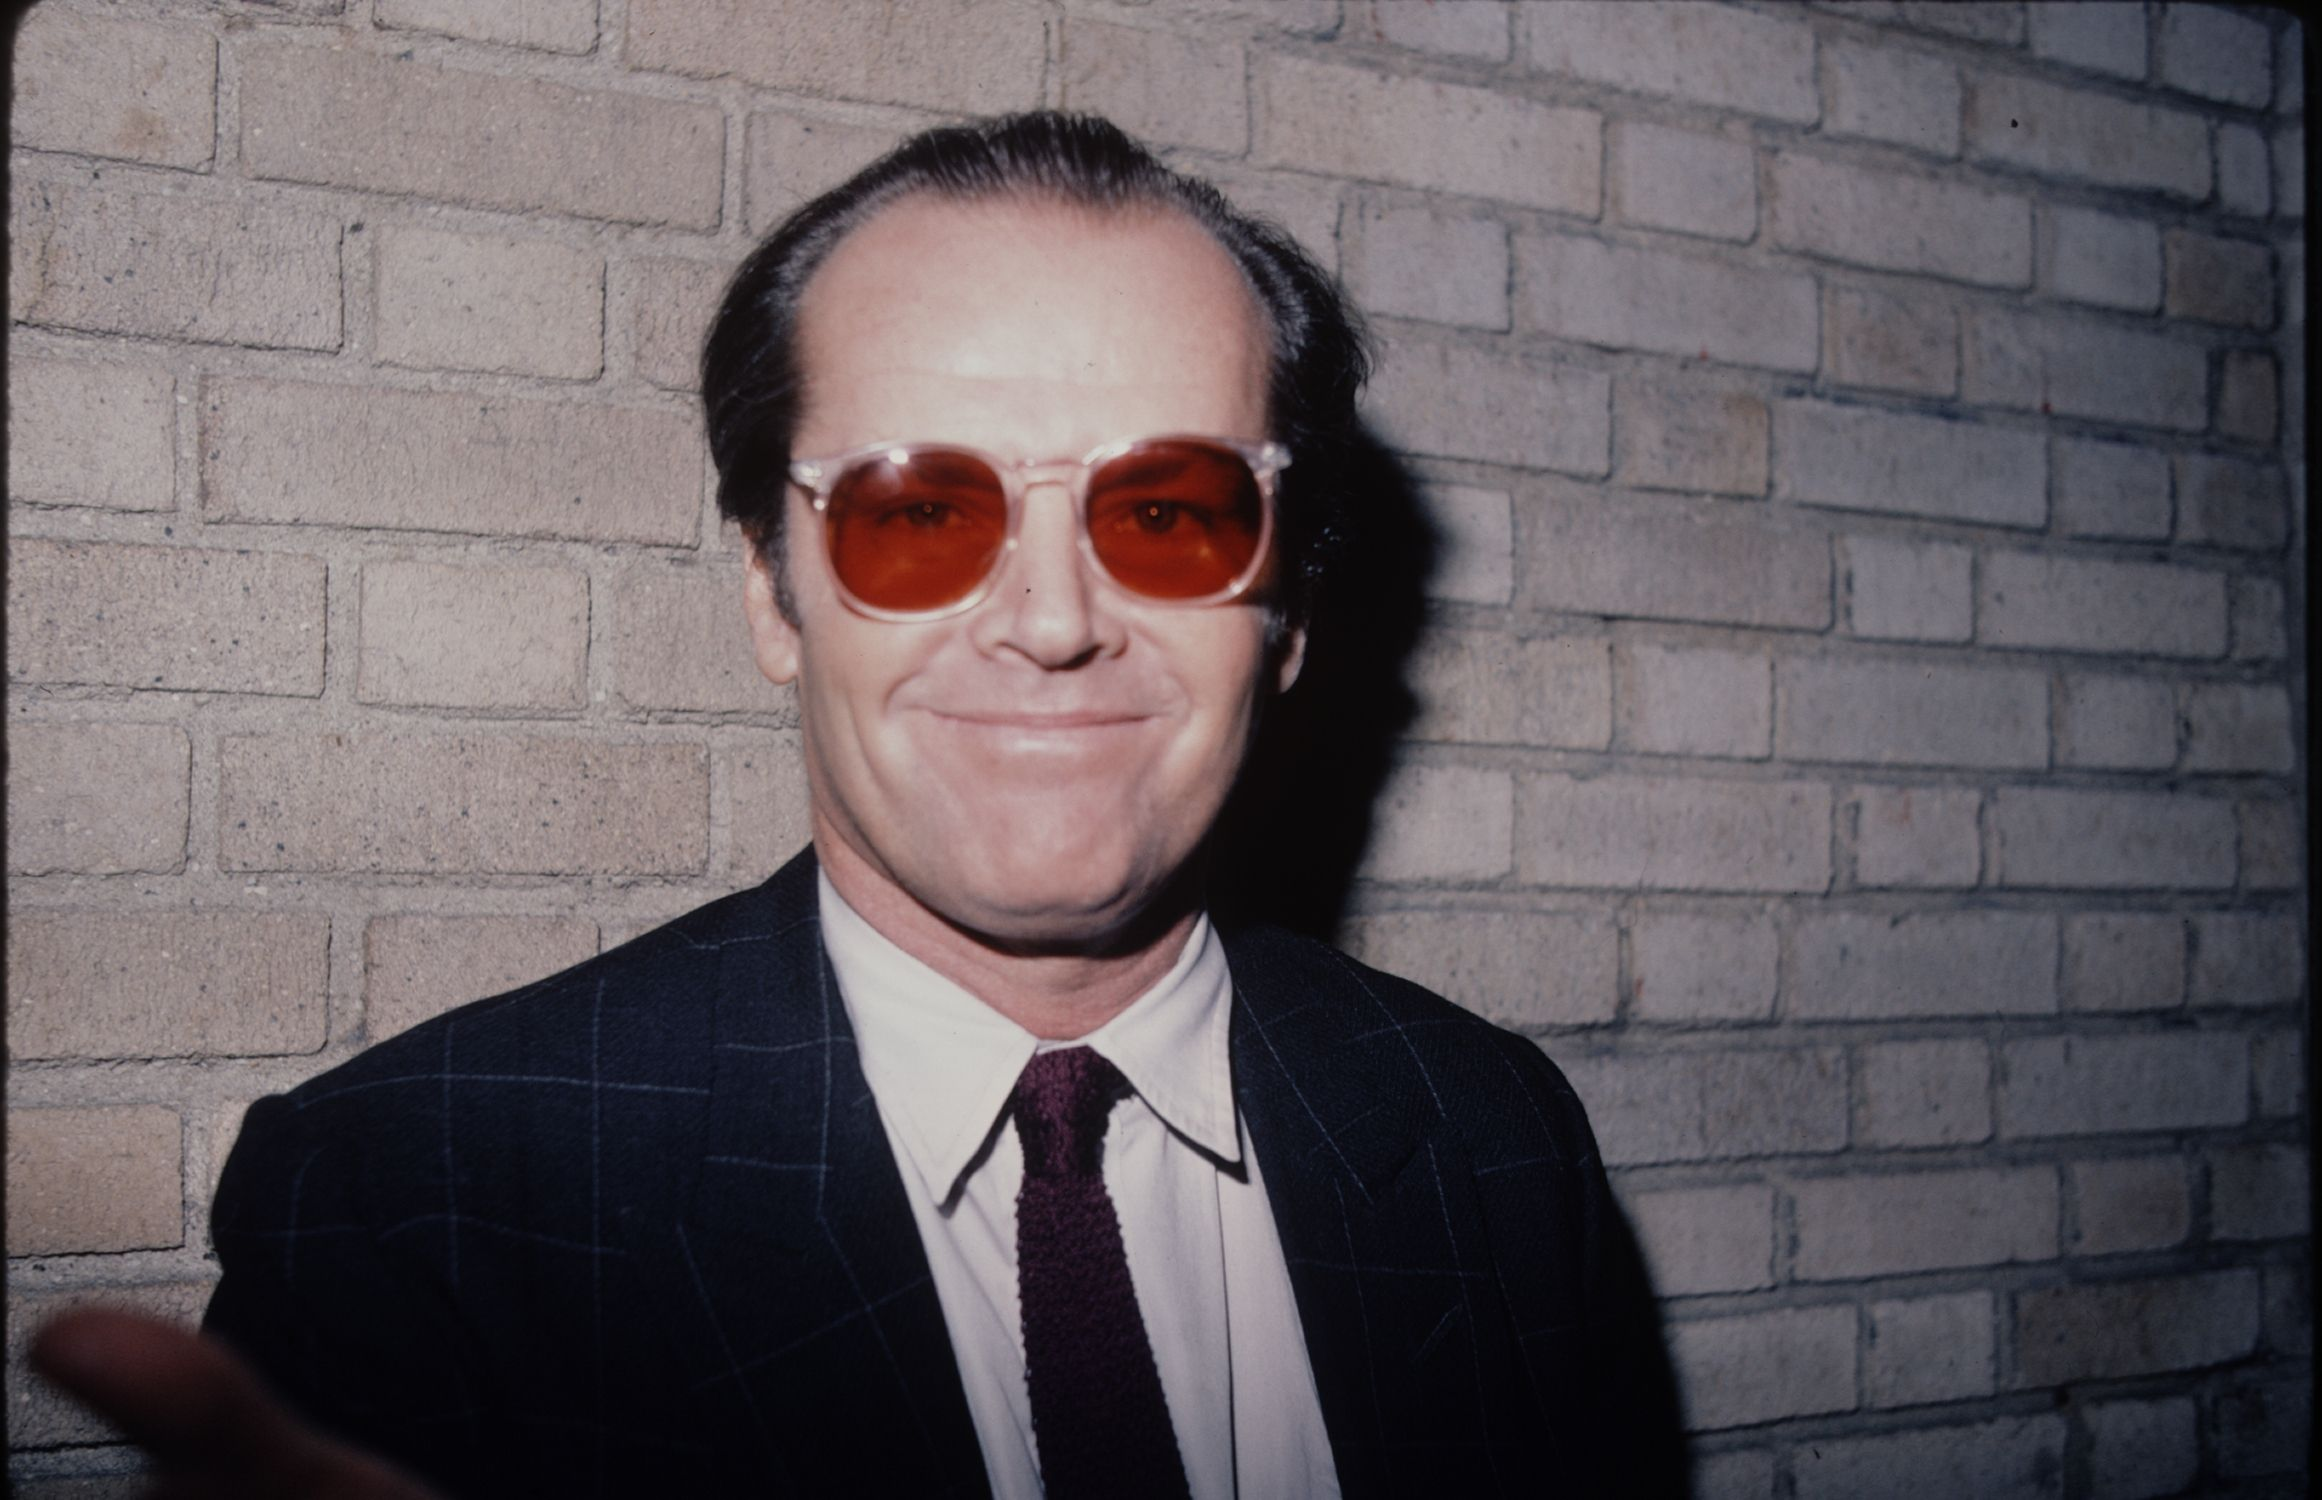 Nio superfina solglasögon du kan personifiera